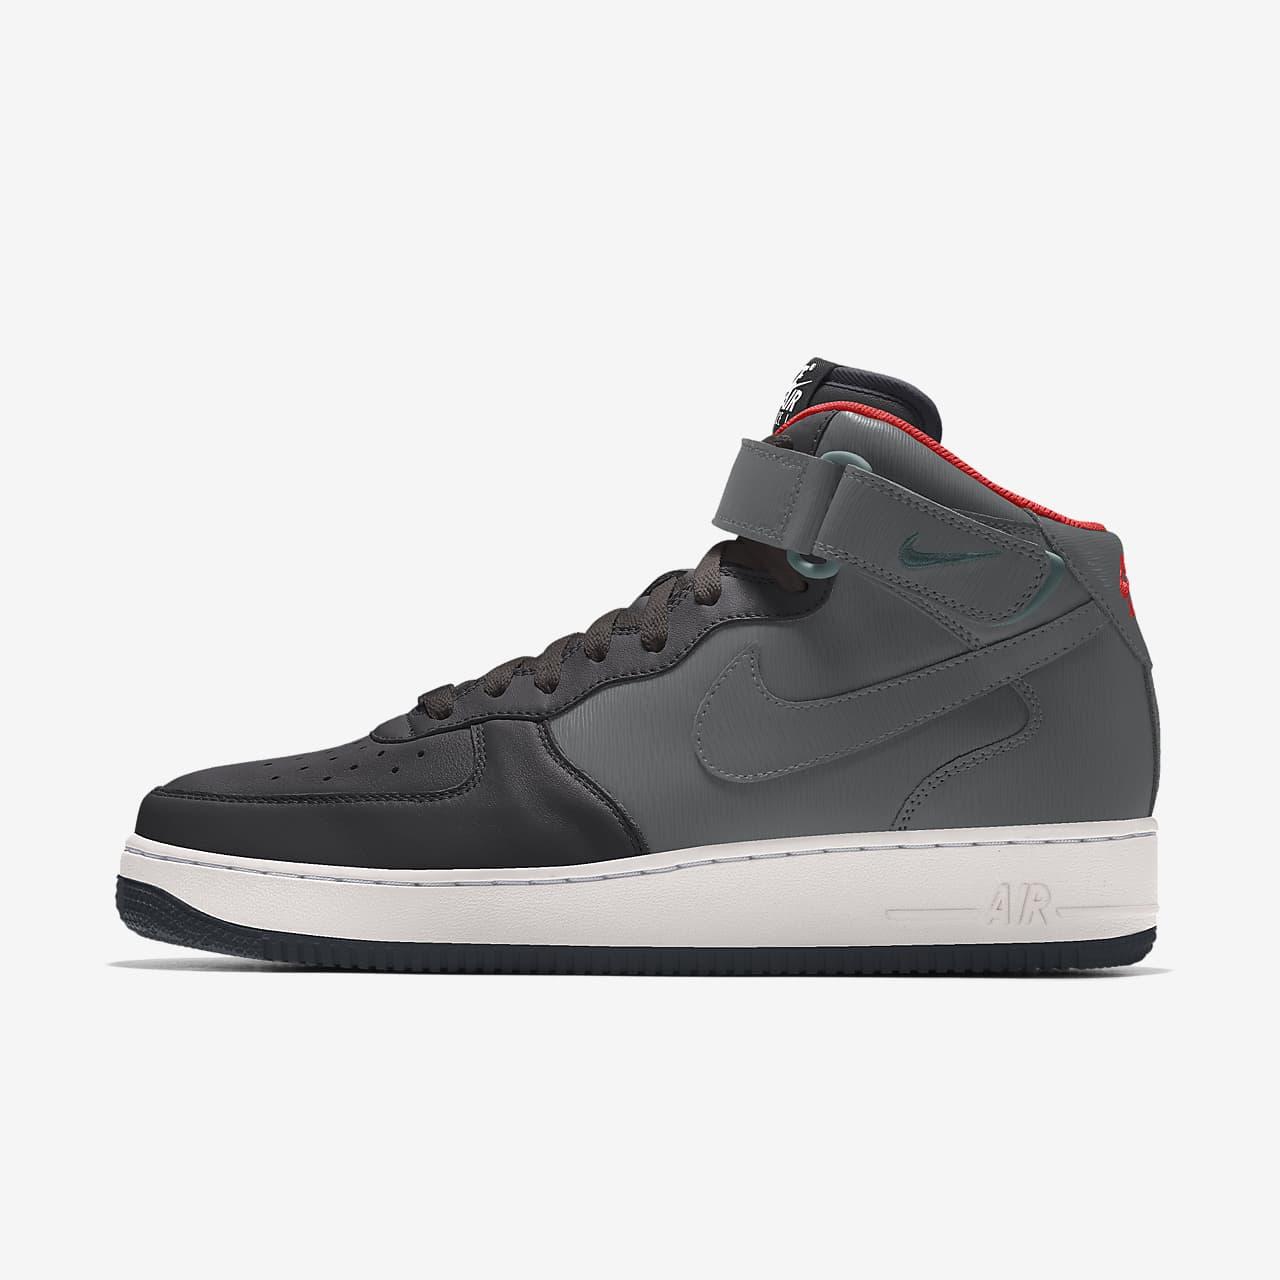 Nike Air Force 1 Mid By You Custom 女子运动鞋